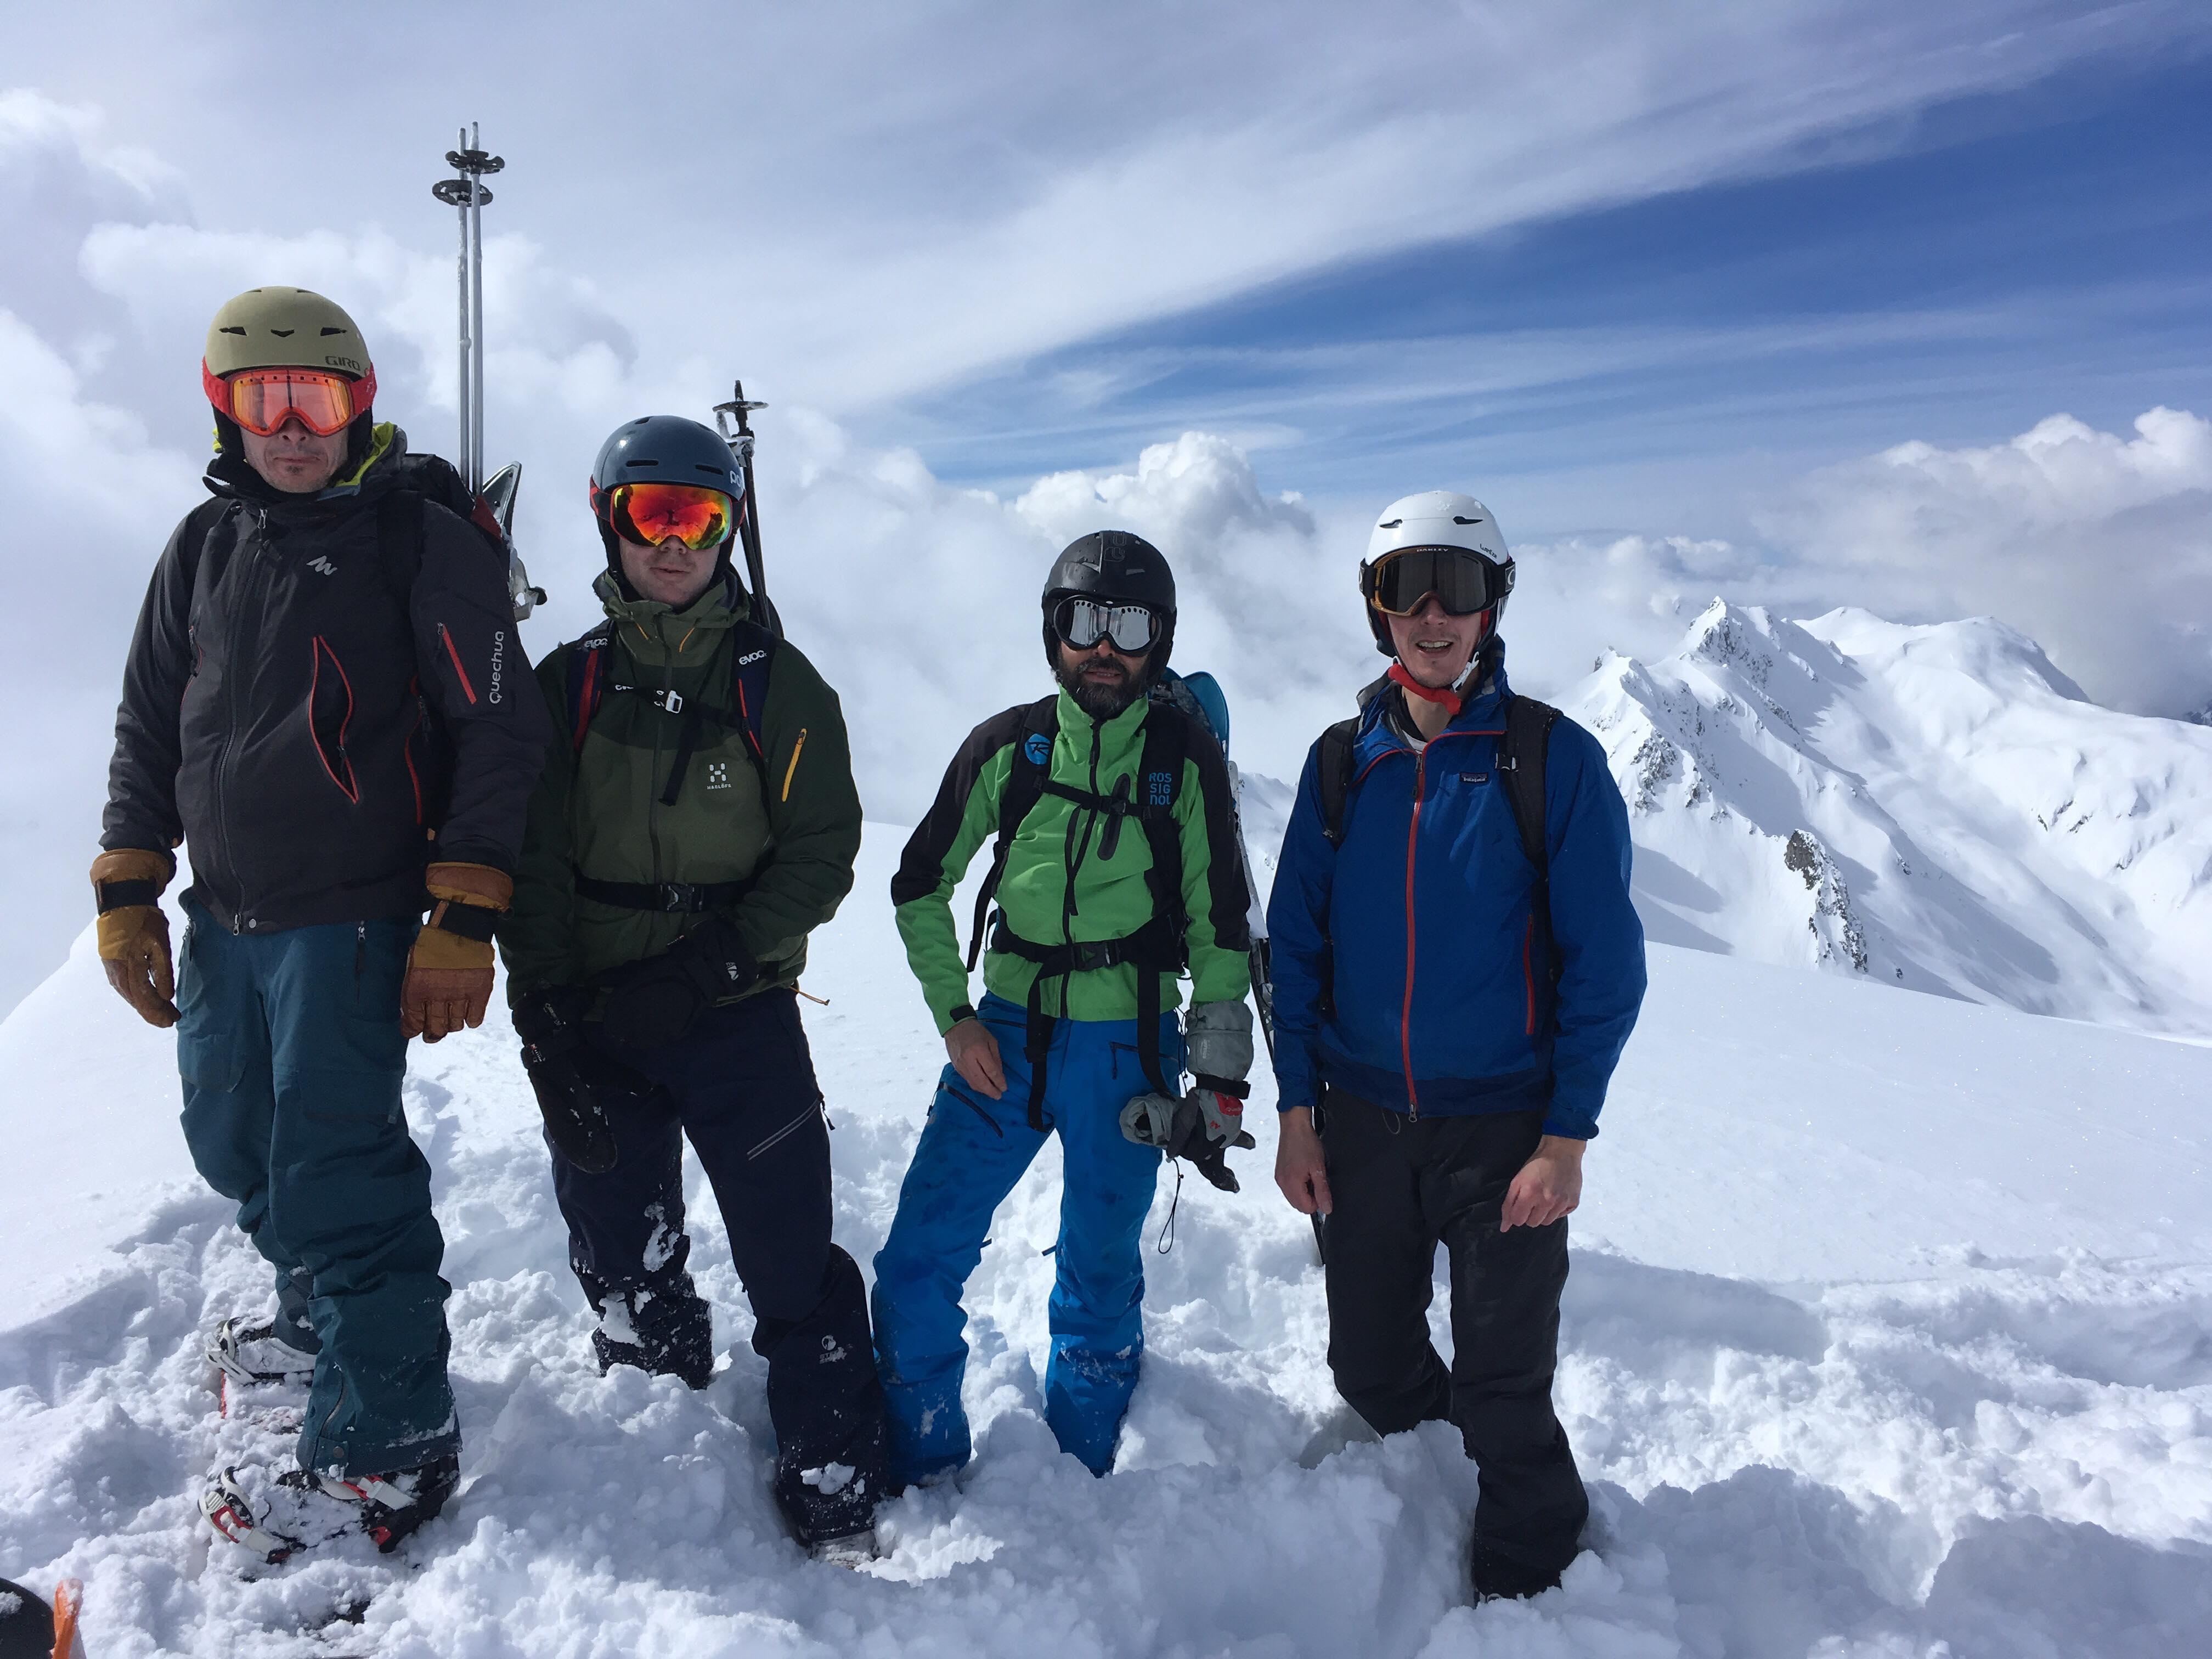 Col de la Louze snowboard 13